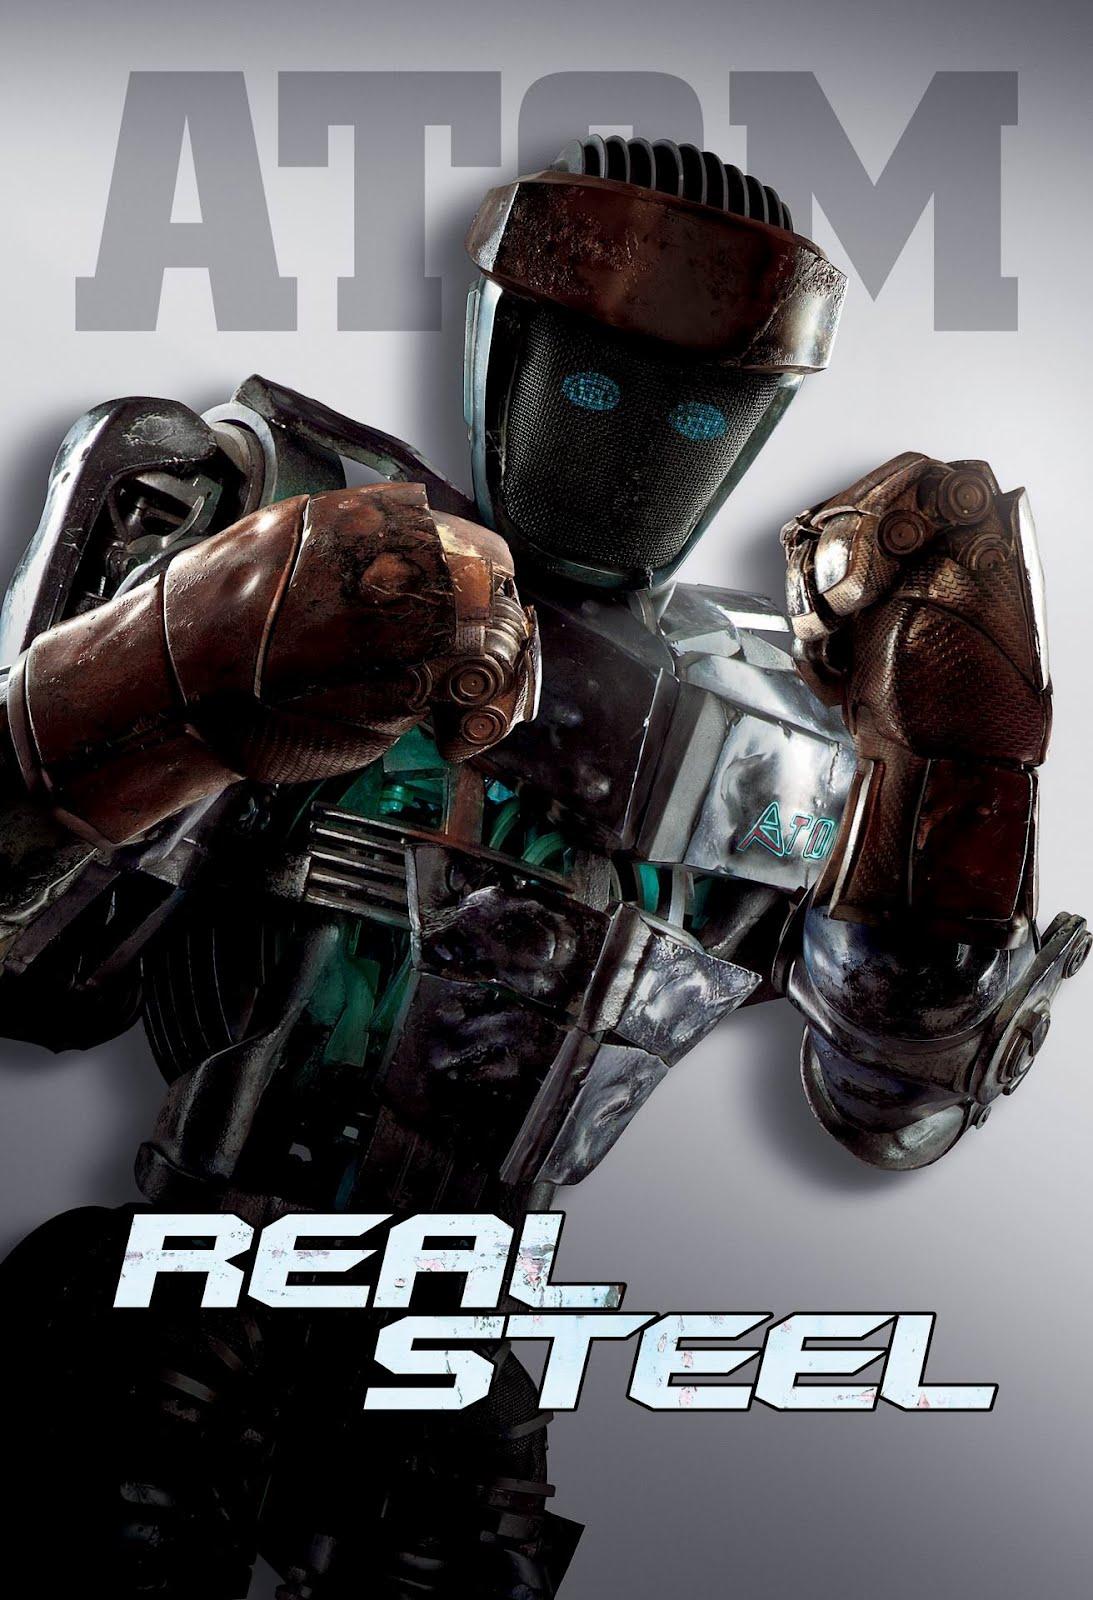 http://1.bp.blogspot.com/-9aT2YgKsrOY/UHEu_-zqgLI/AAAAAAAAKW0/ZZwNe47v_aY/s1600/real_steel_2011_6054_poster.jpg